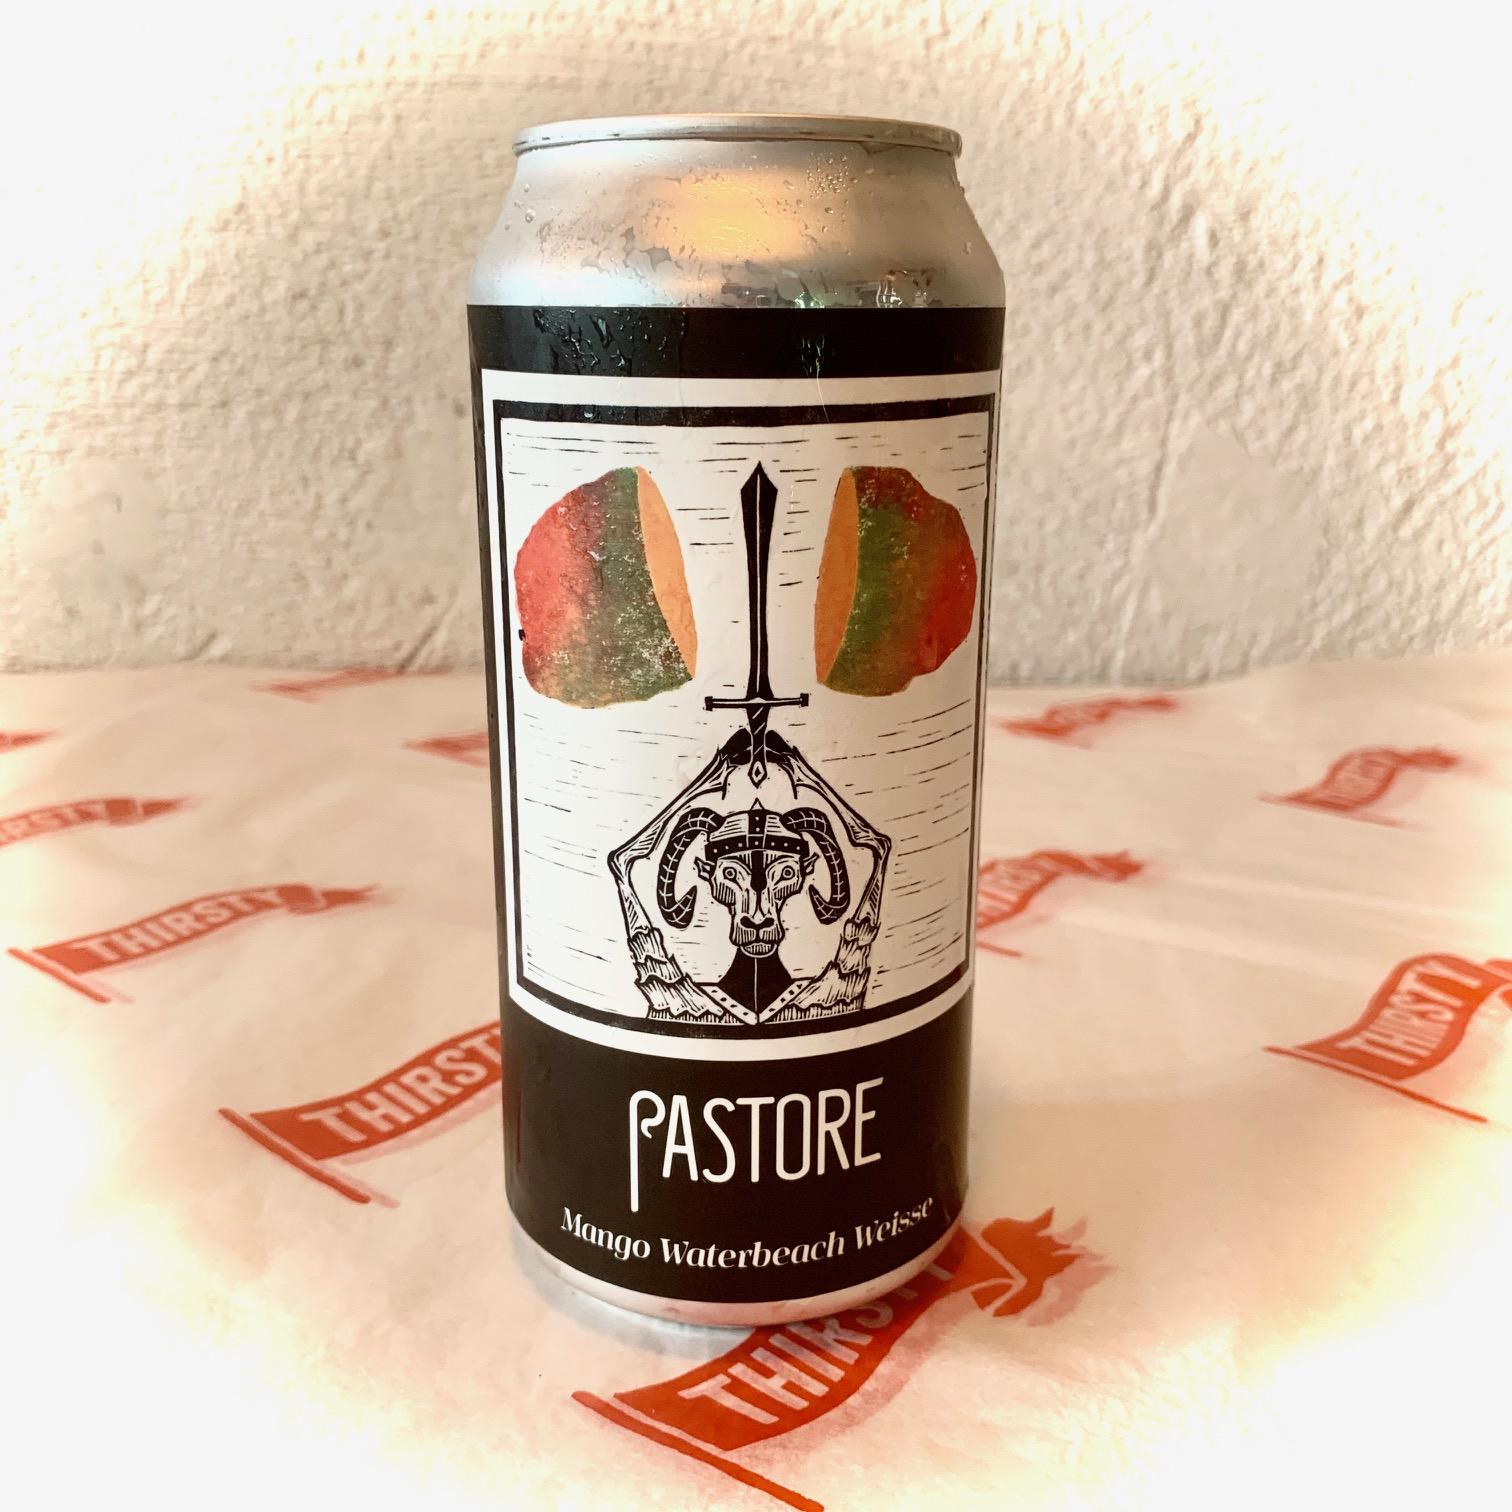 Pastore | Mango Waterbeach Weisse | 4.5% 440ml